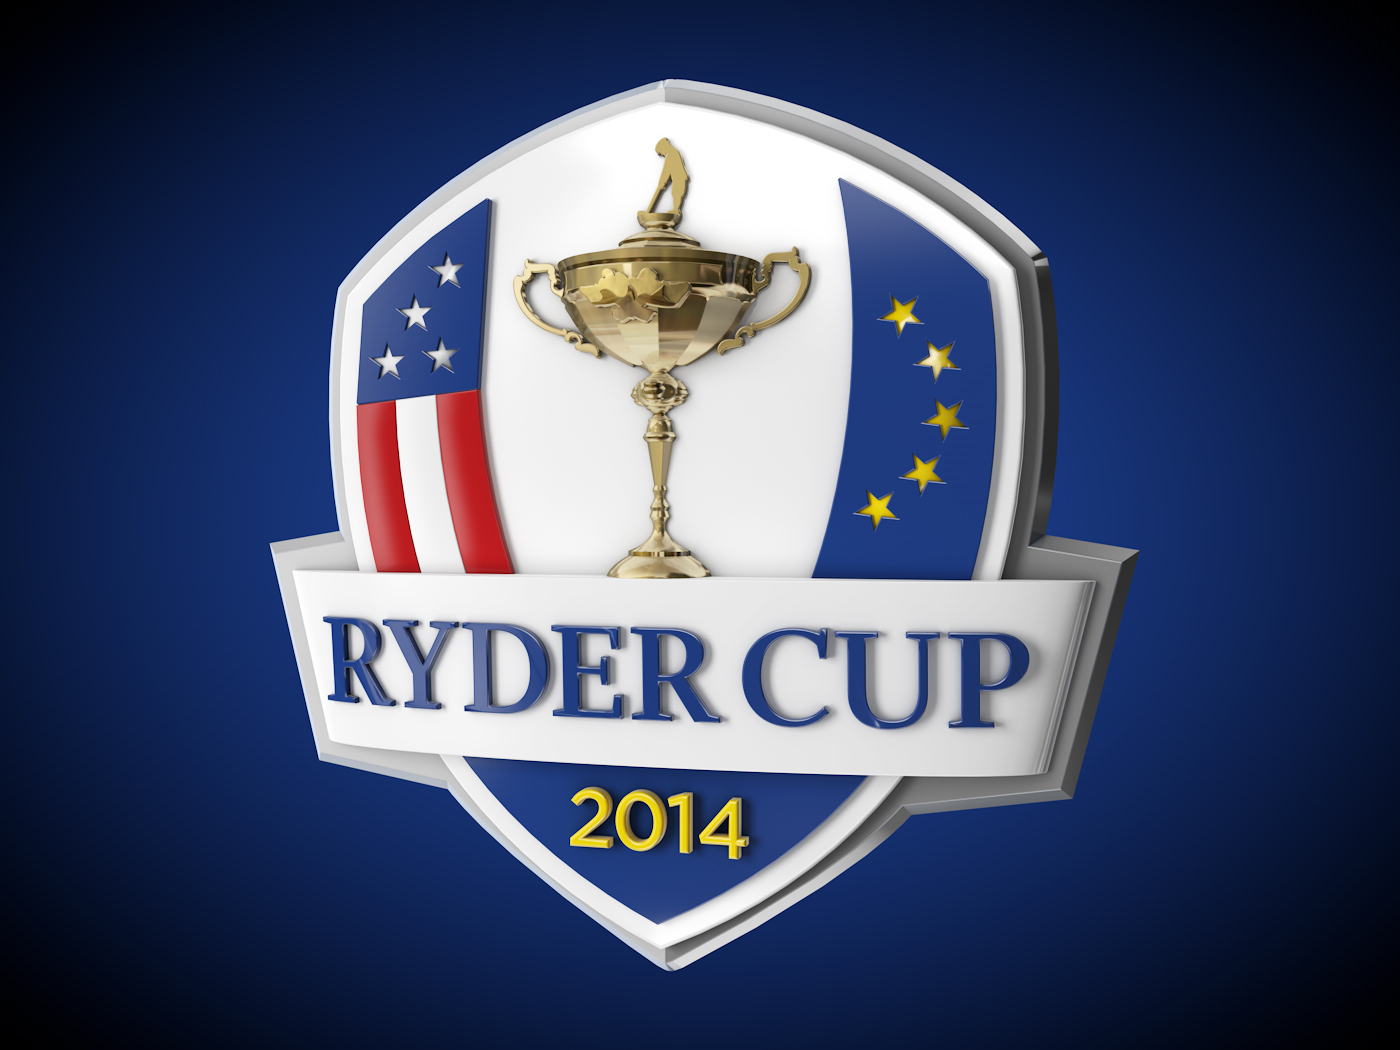 Ryder Cup 4 Sky